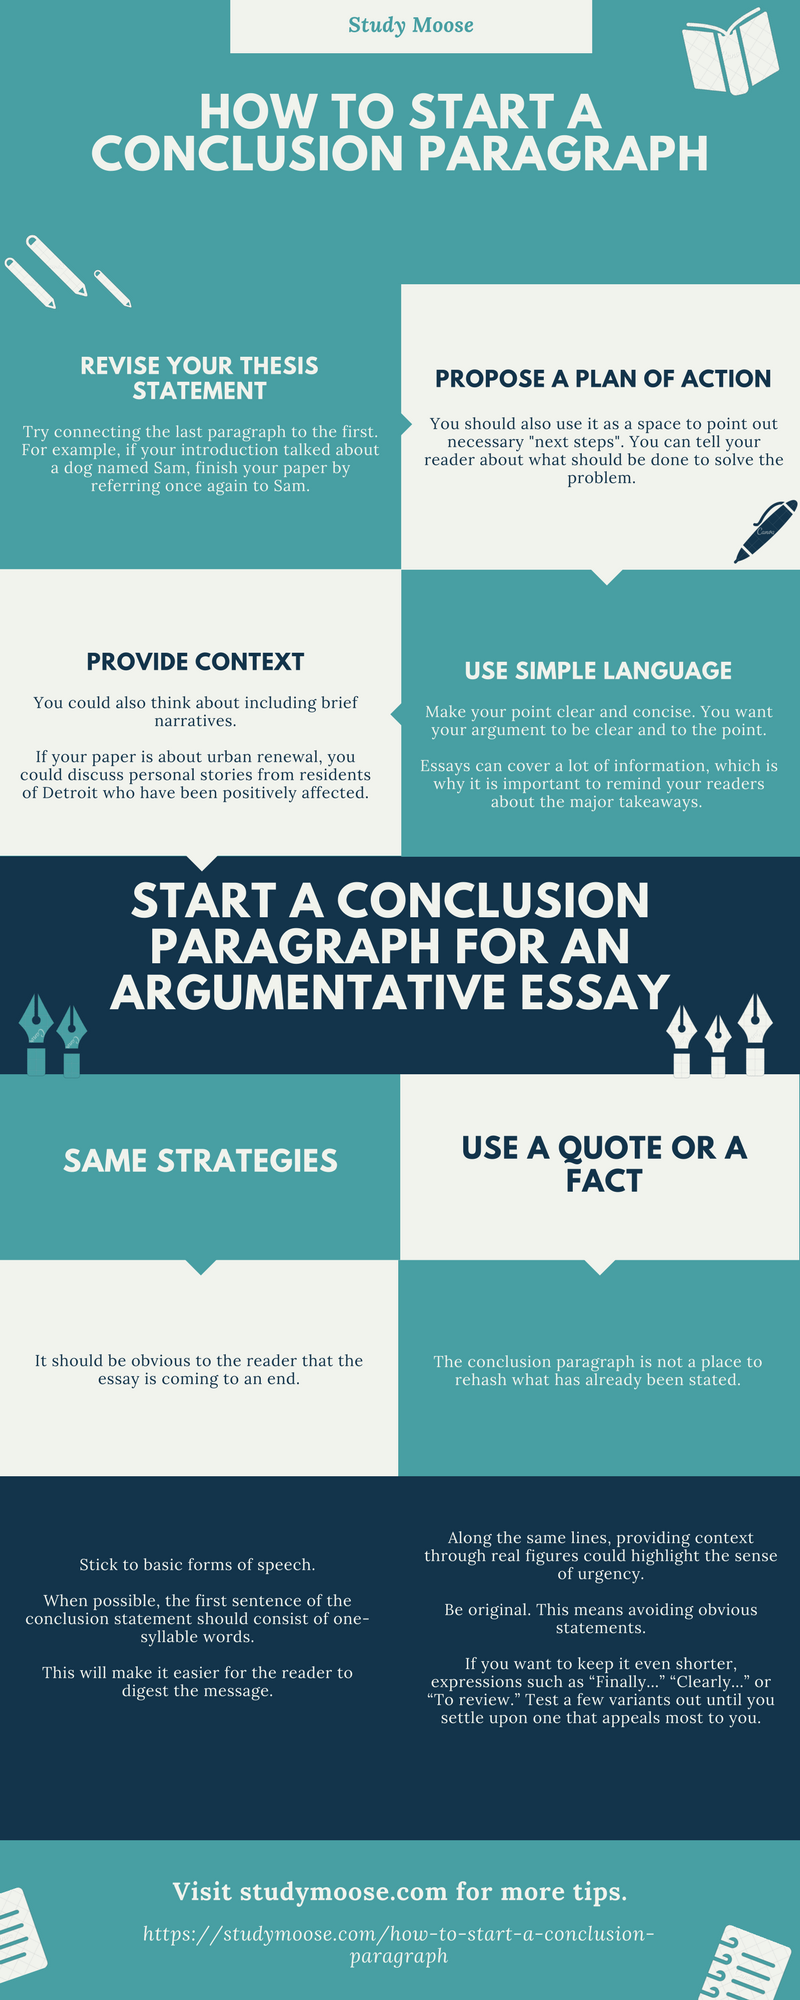 how to make a closing paragraph